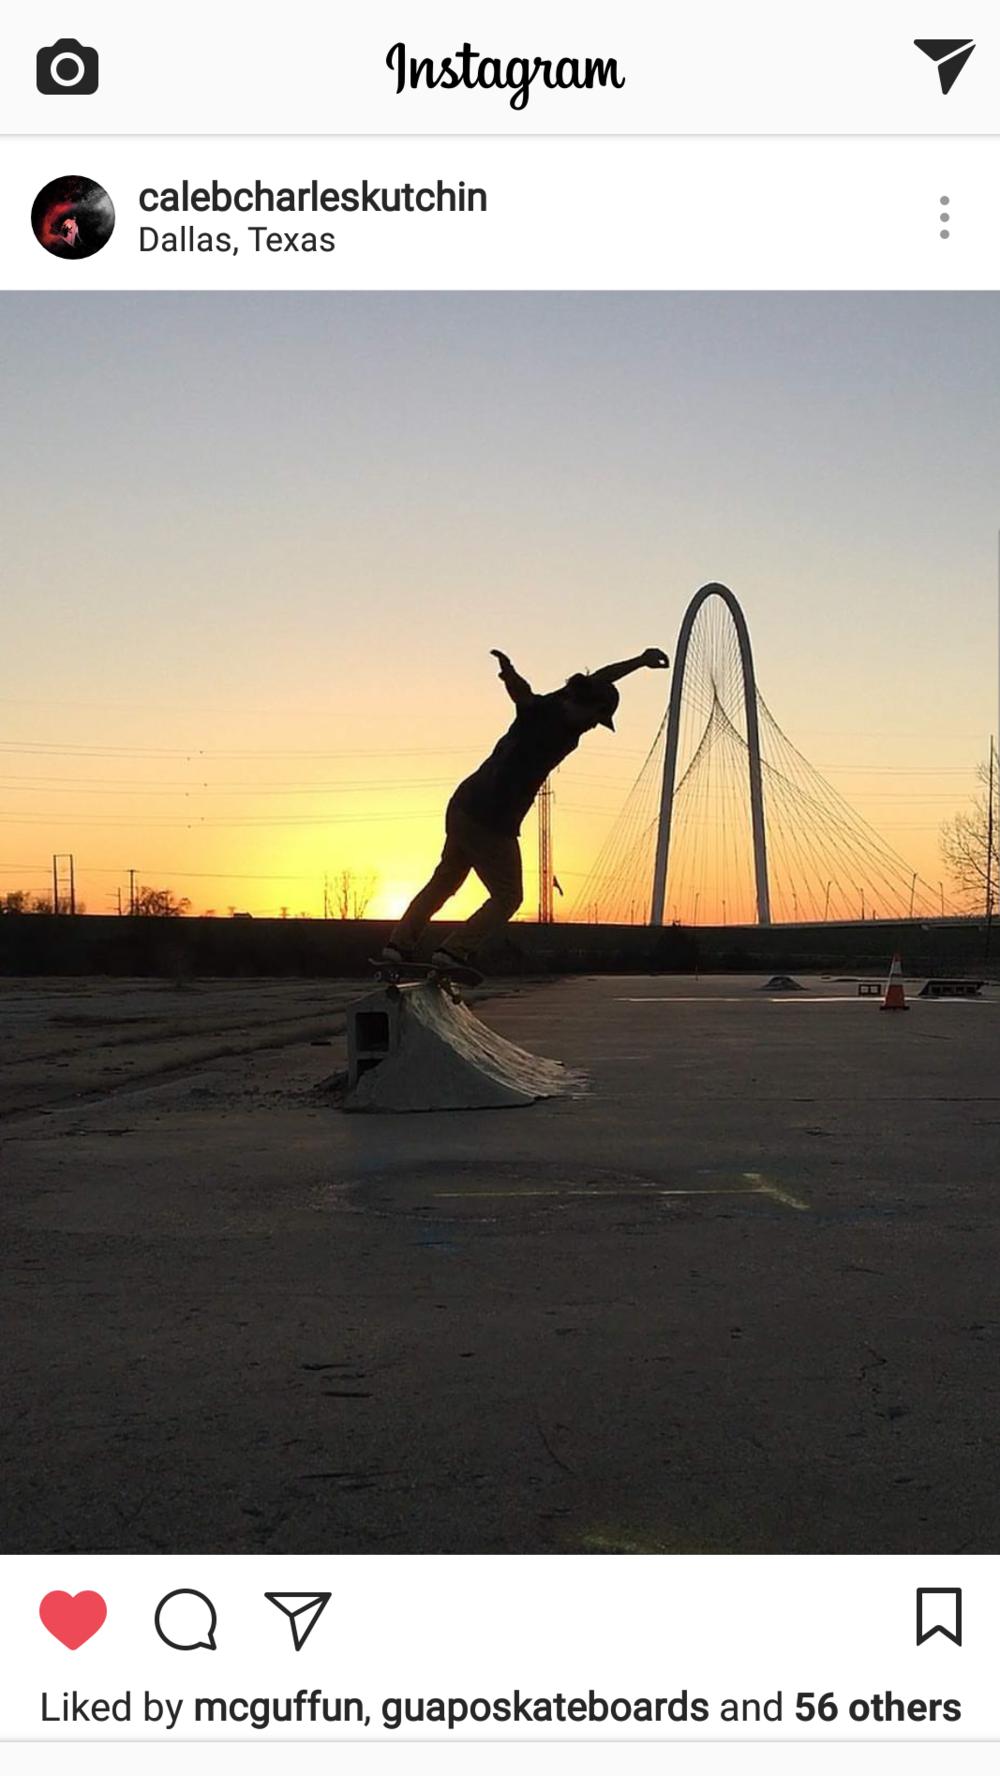 Dallas skater Caleb Kutchin skating against a silhouette of the Margaret Hunt Hill Bridge in Dallas